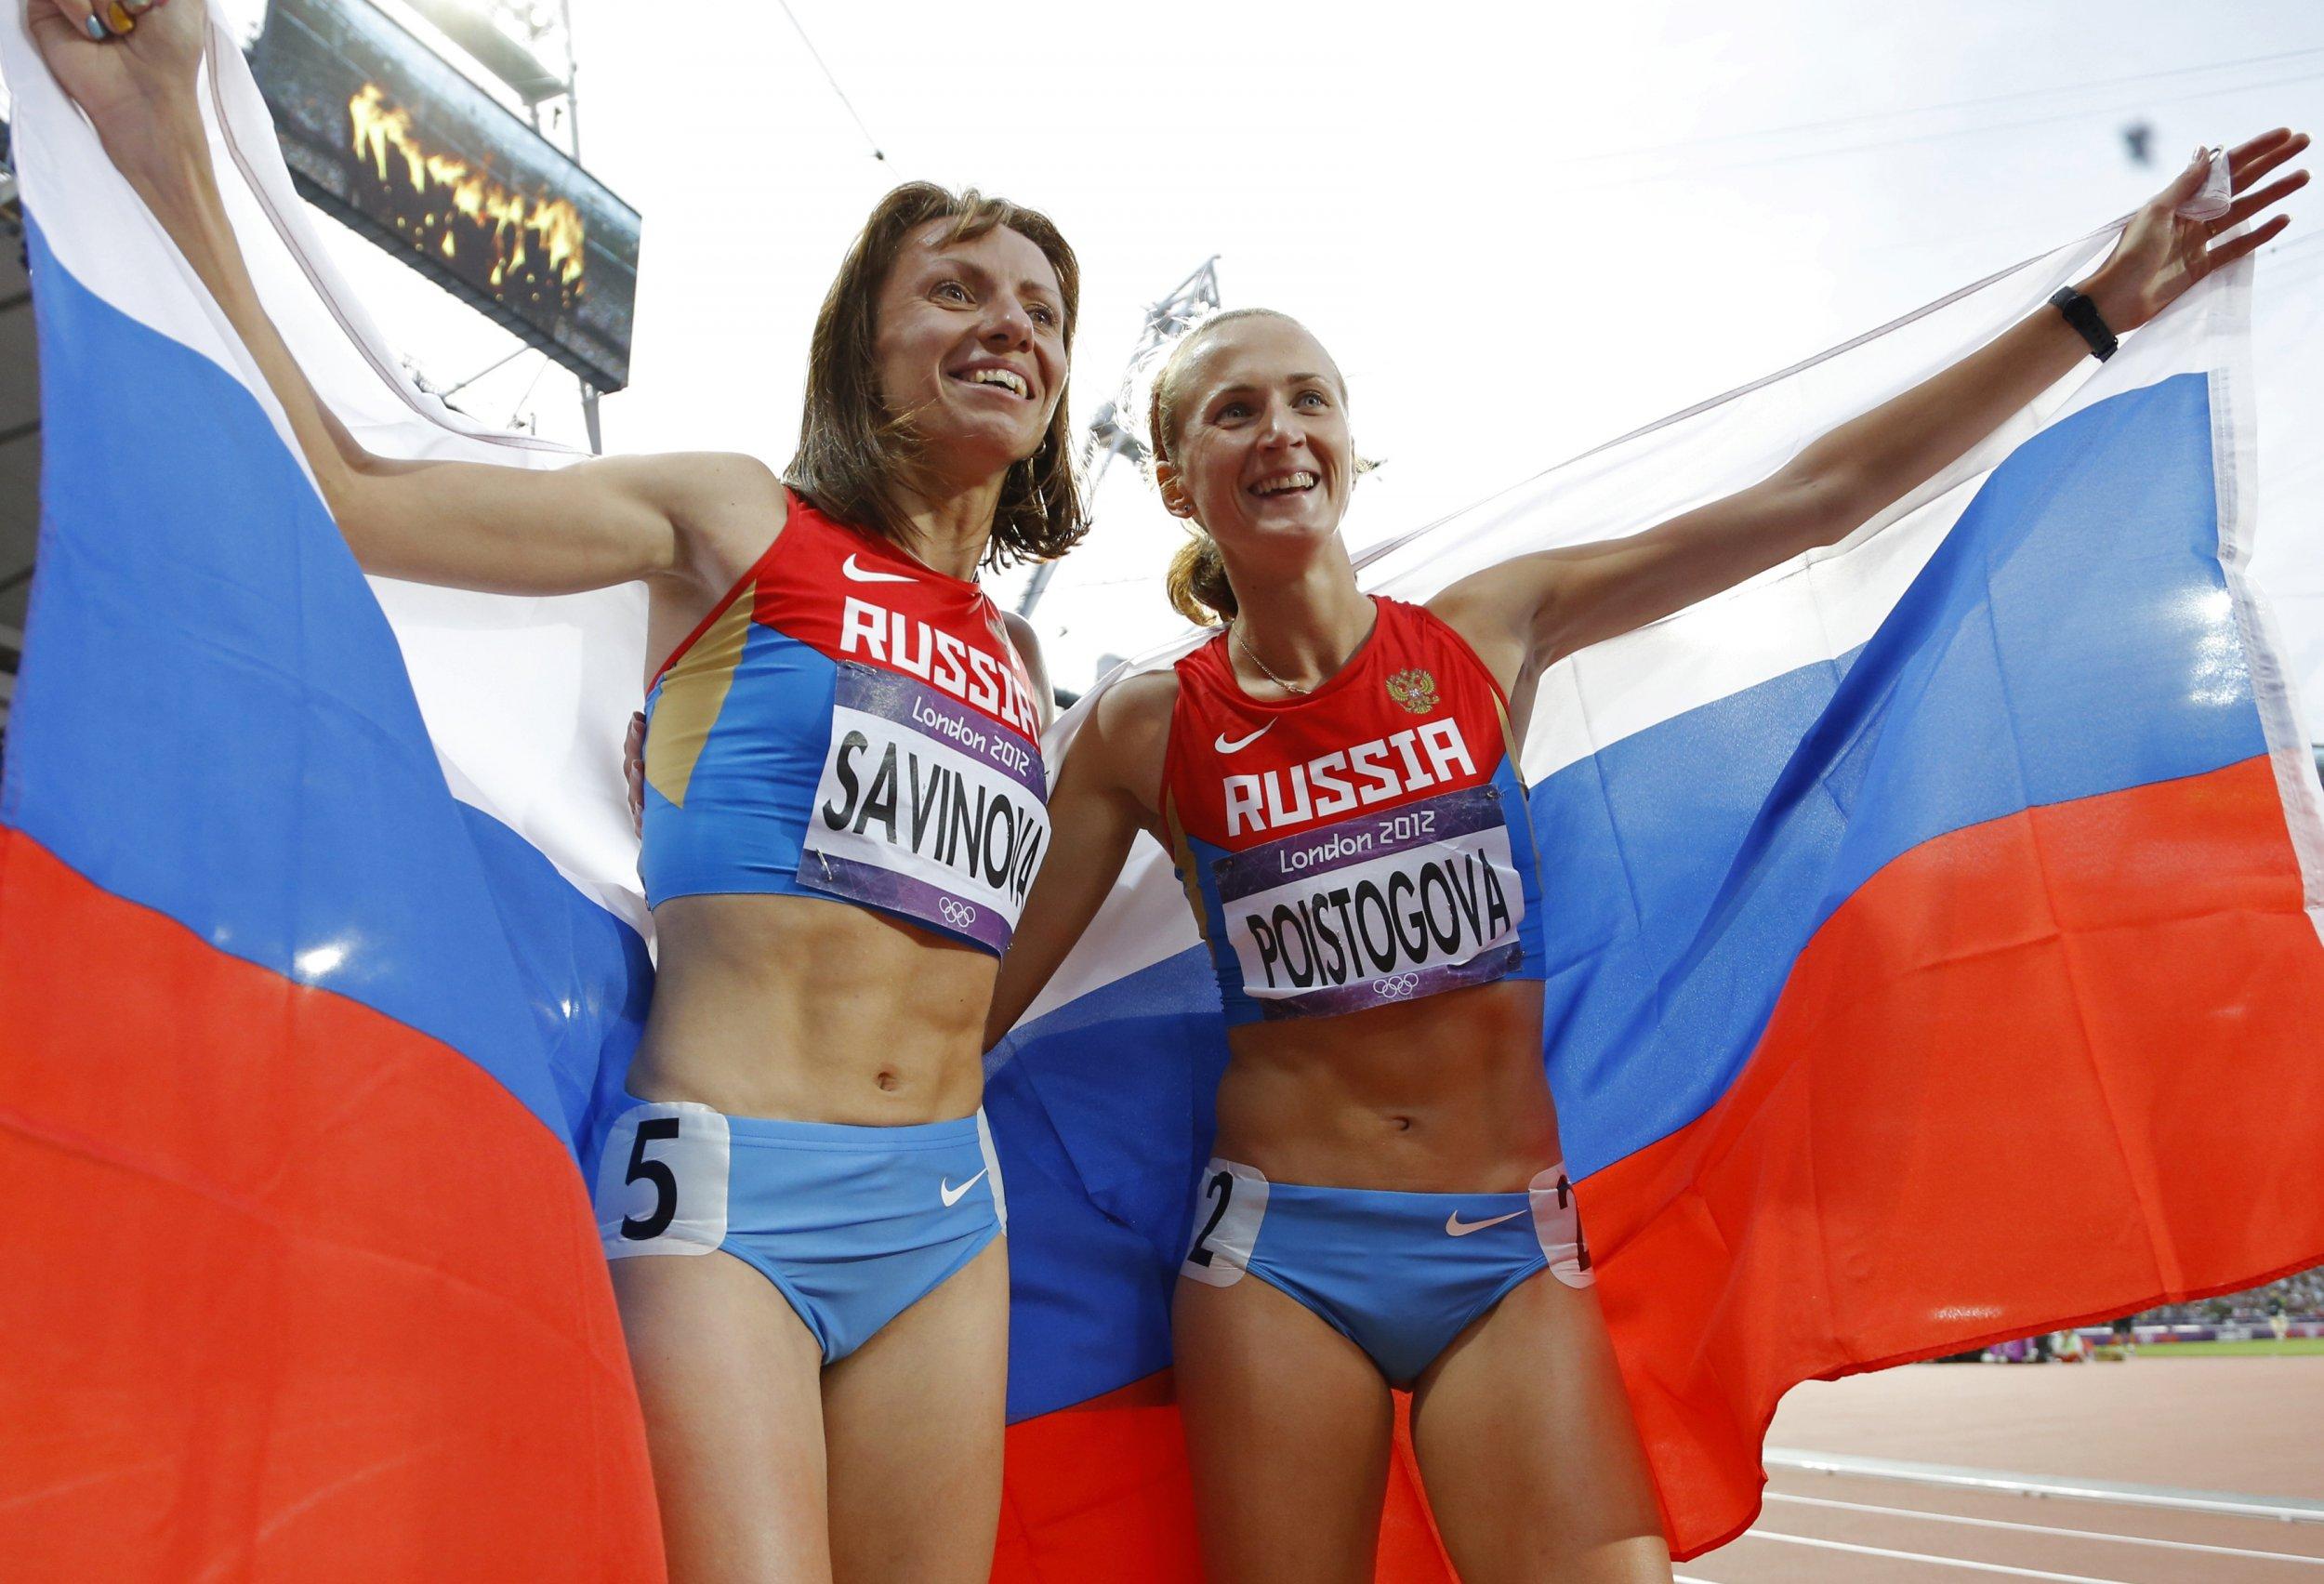 0111_Savinova_Poistogova_01